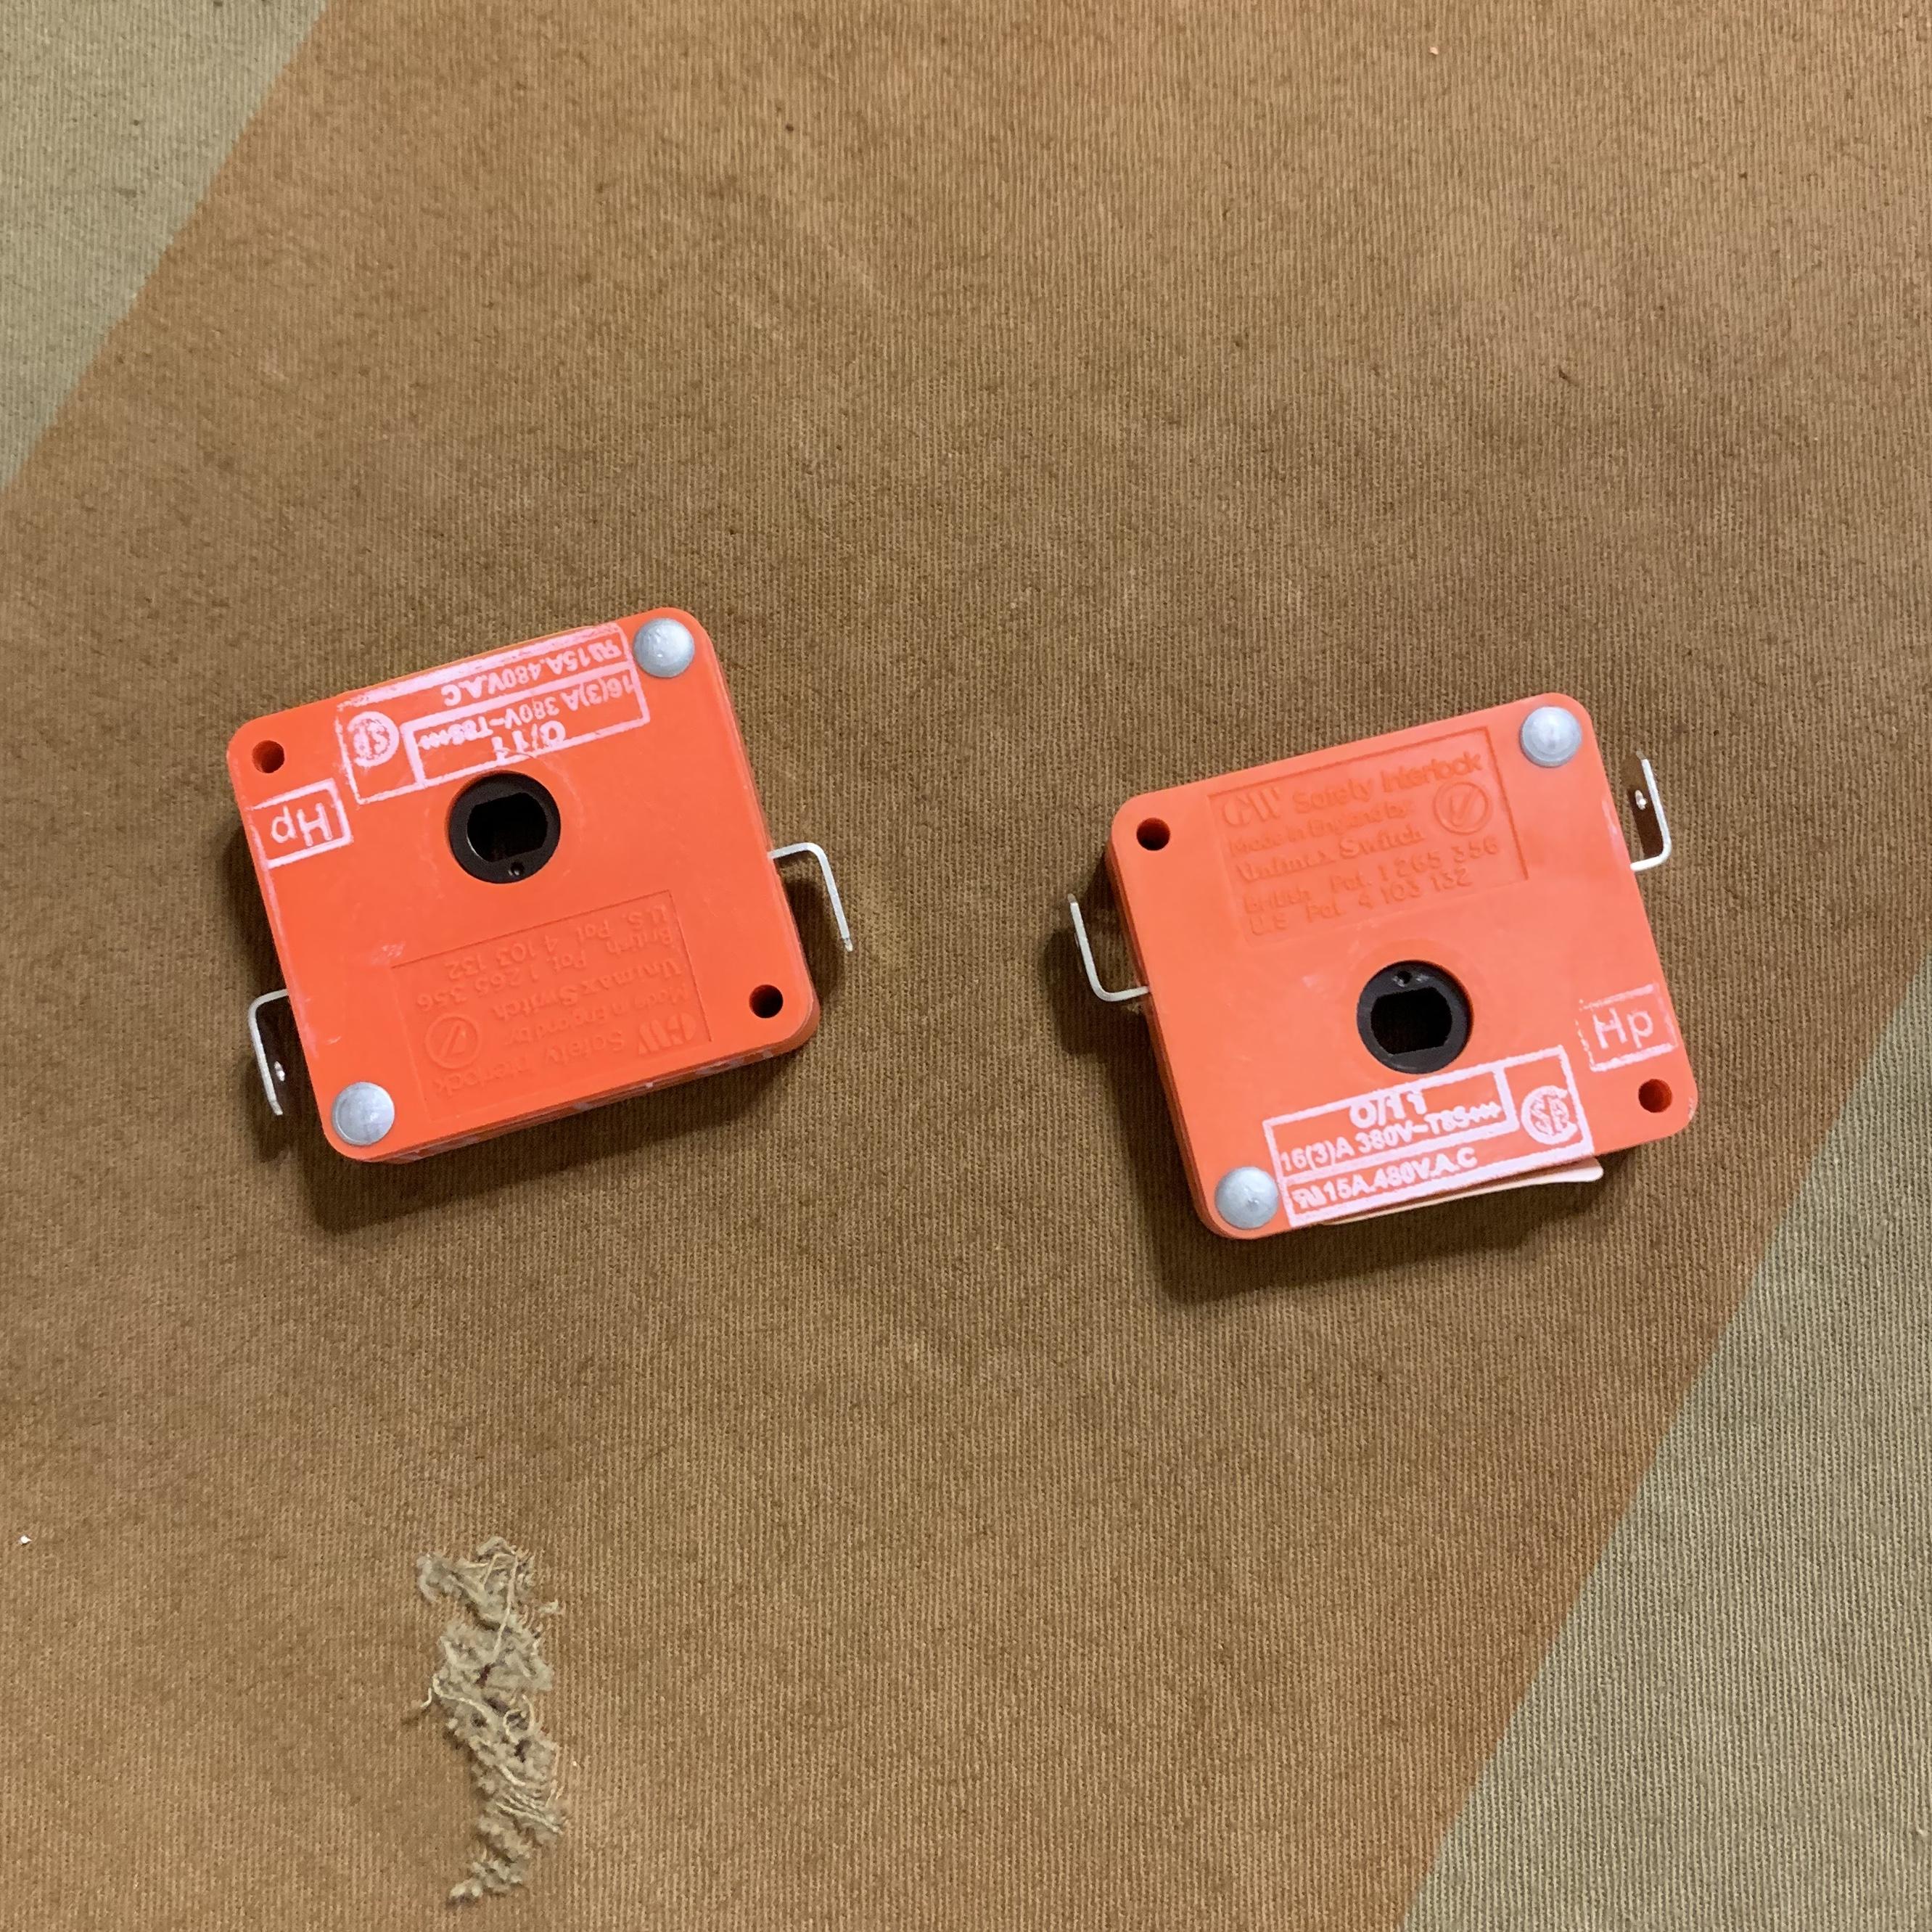 6F4BAF74-E6EB-4A7D-A9BC-D6828852B0B1.jpeg